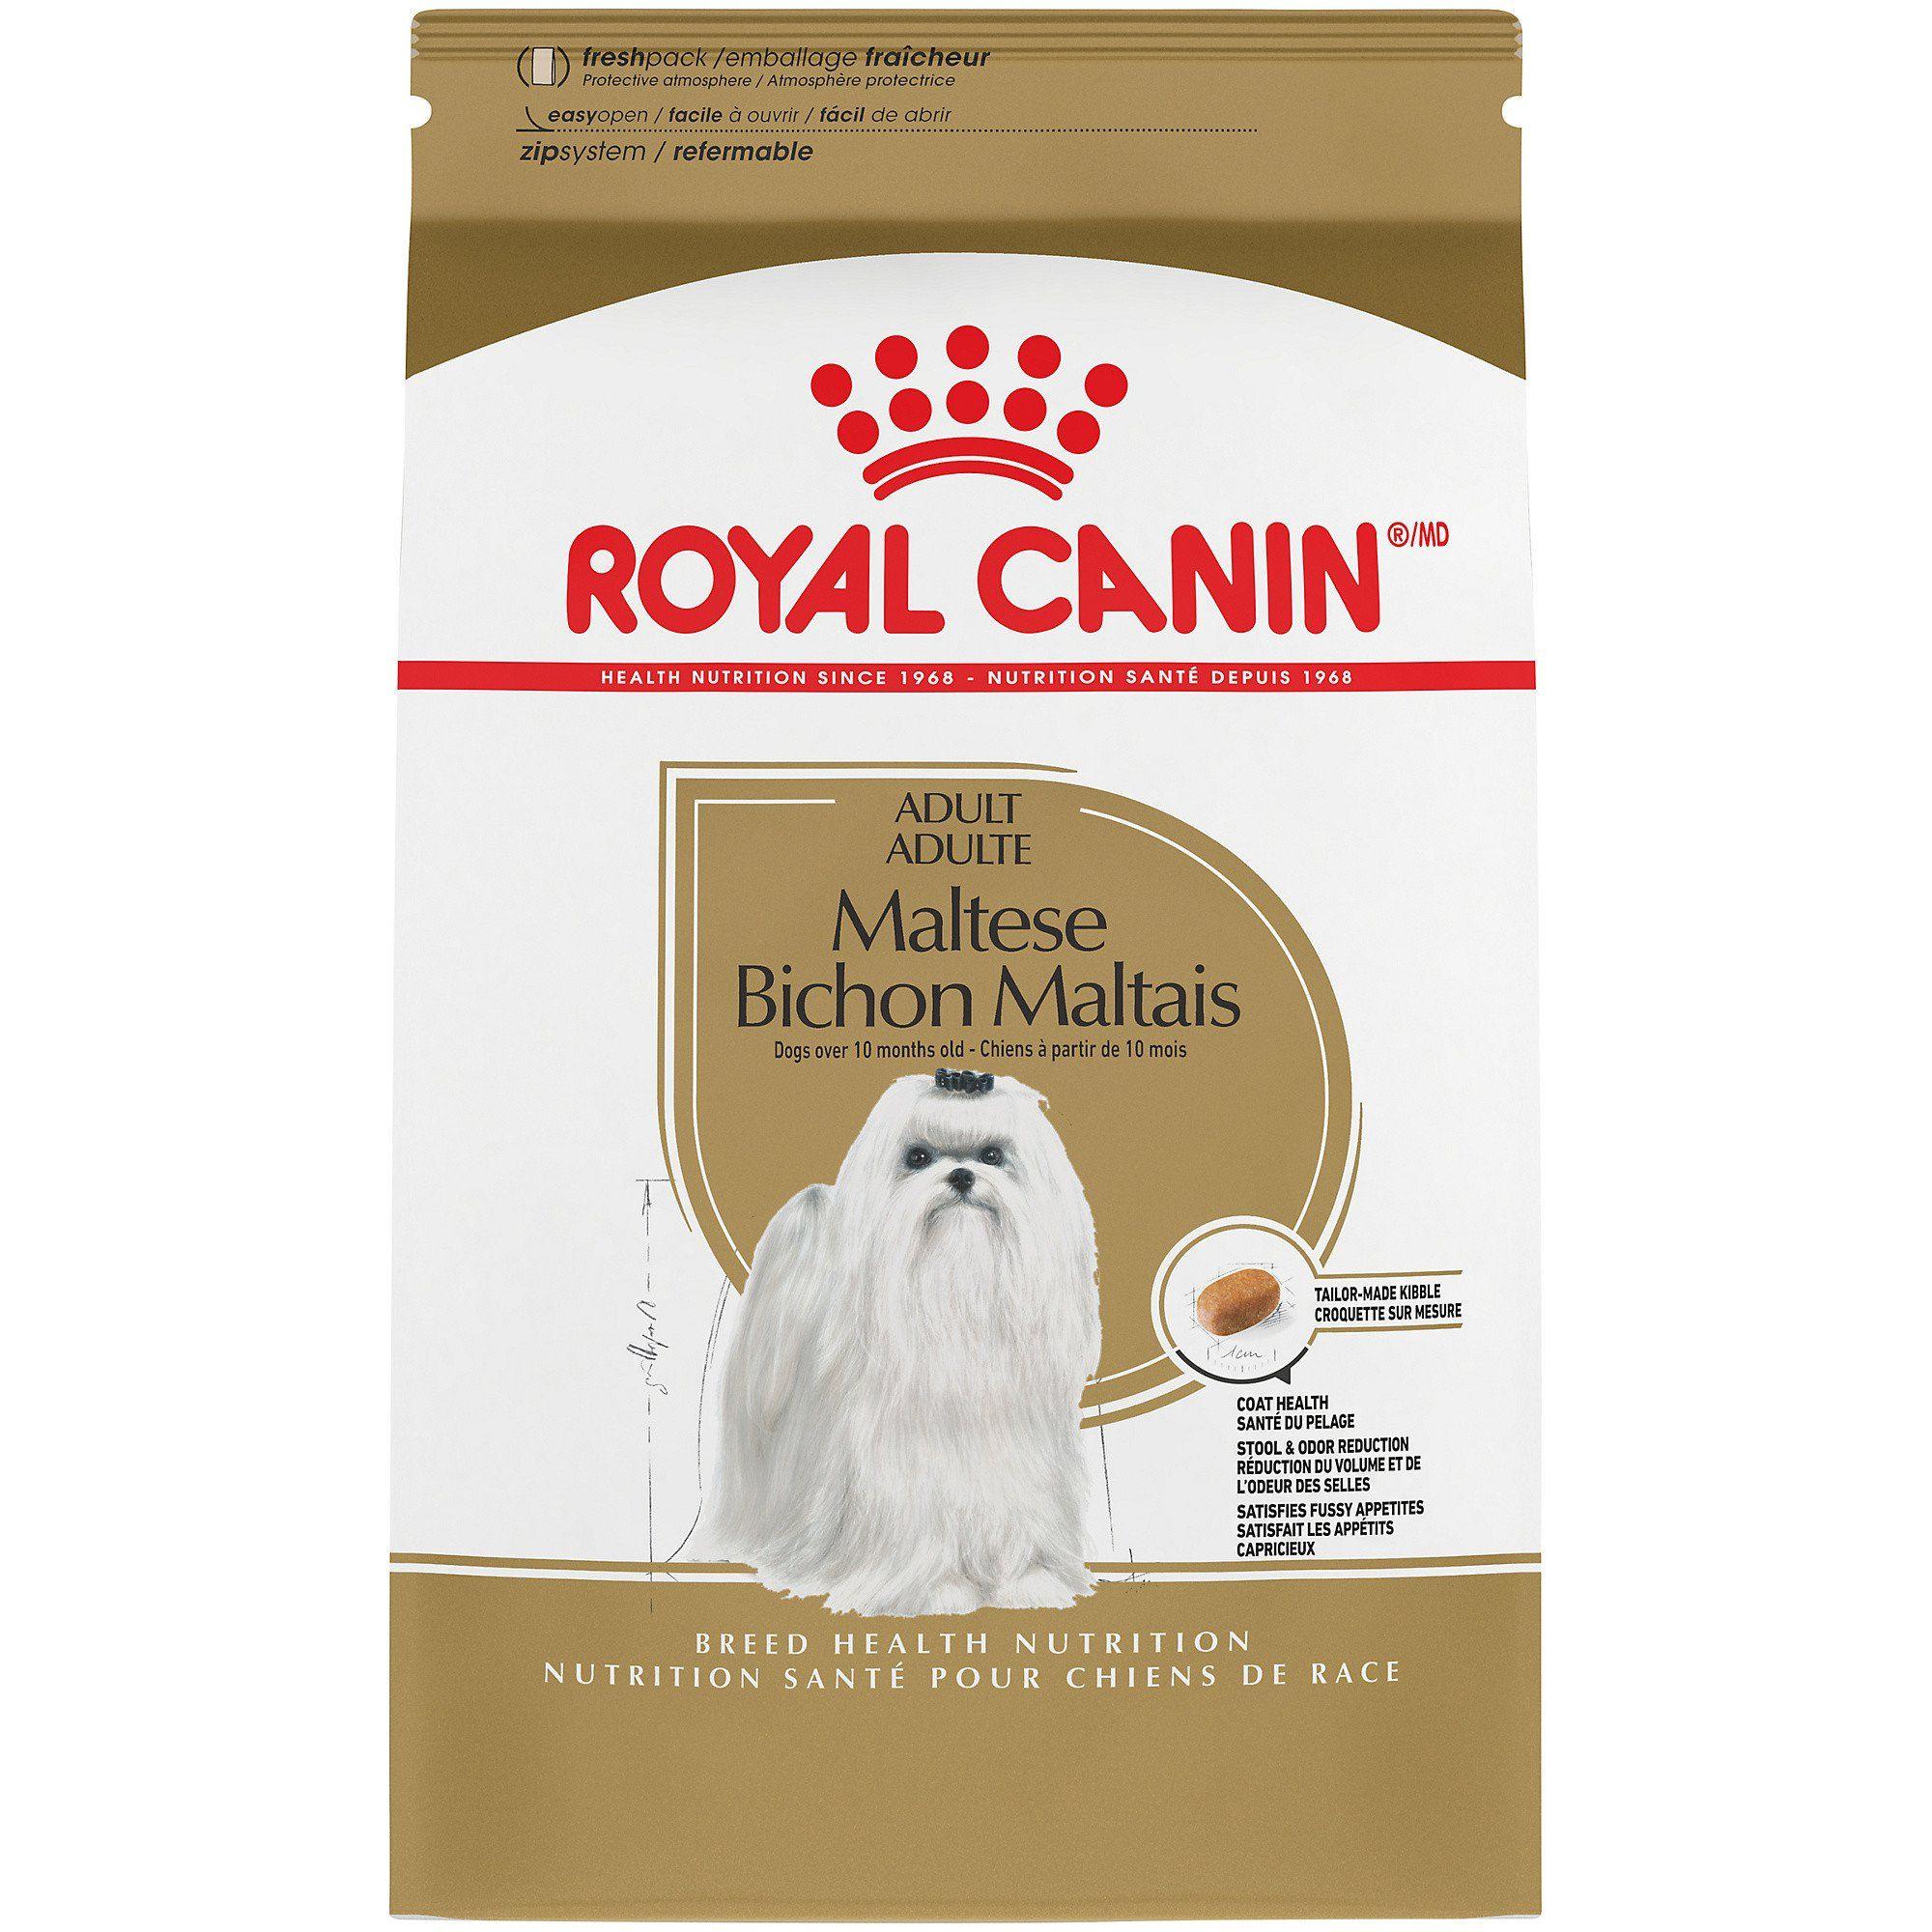 Royal Canin Breed Health Nutrition Miniature Schnauzer Puppy Food